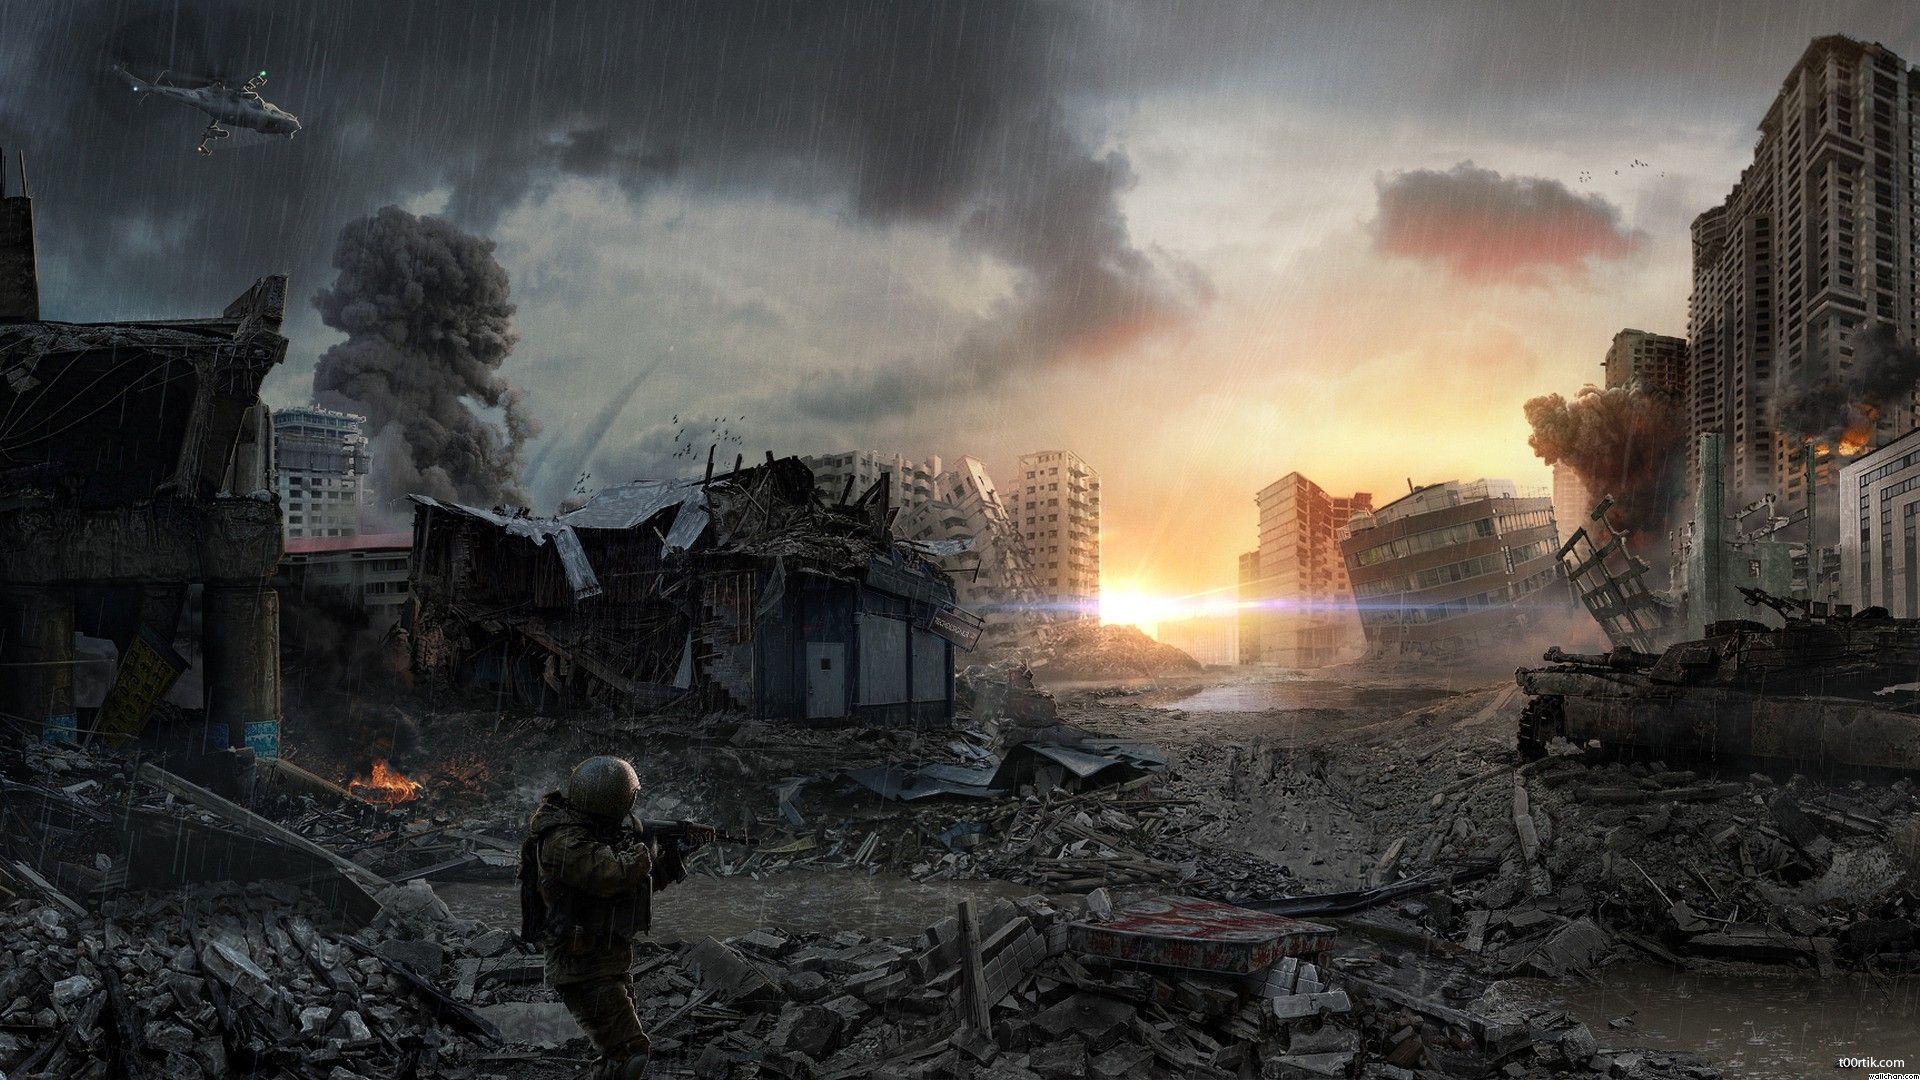 Apocalypse Battle War Soldier Wallchan 203618 Jpg 1920 1080